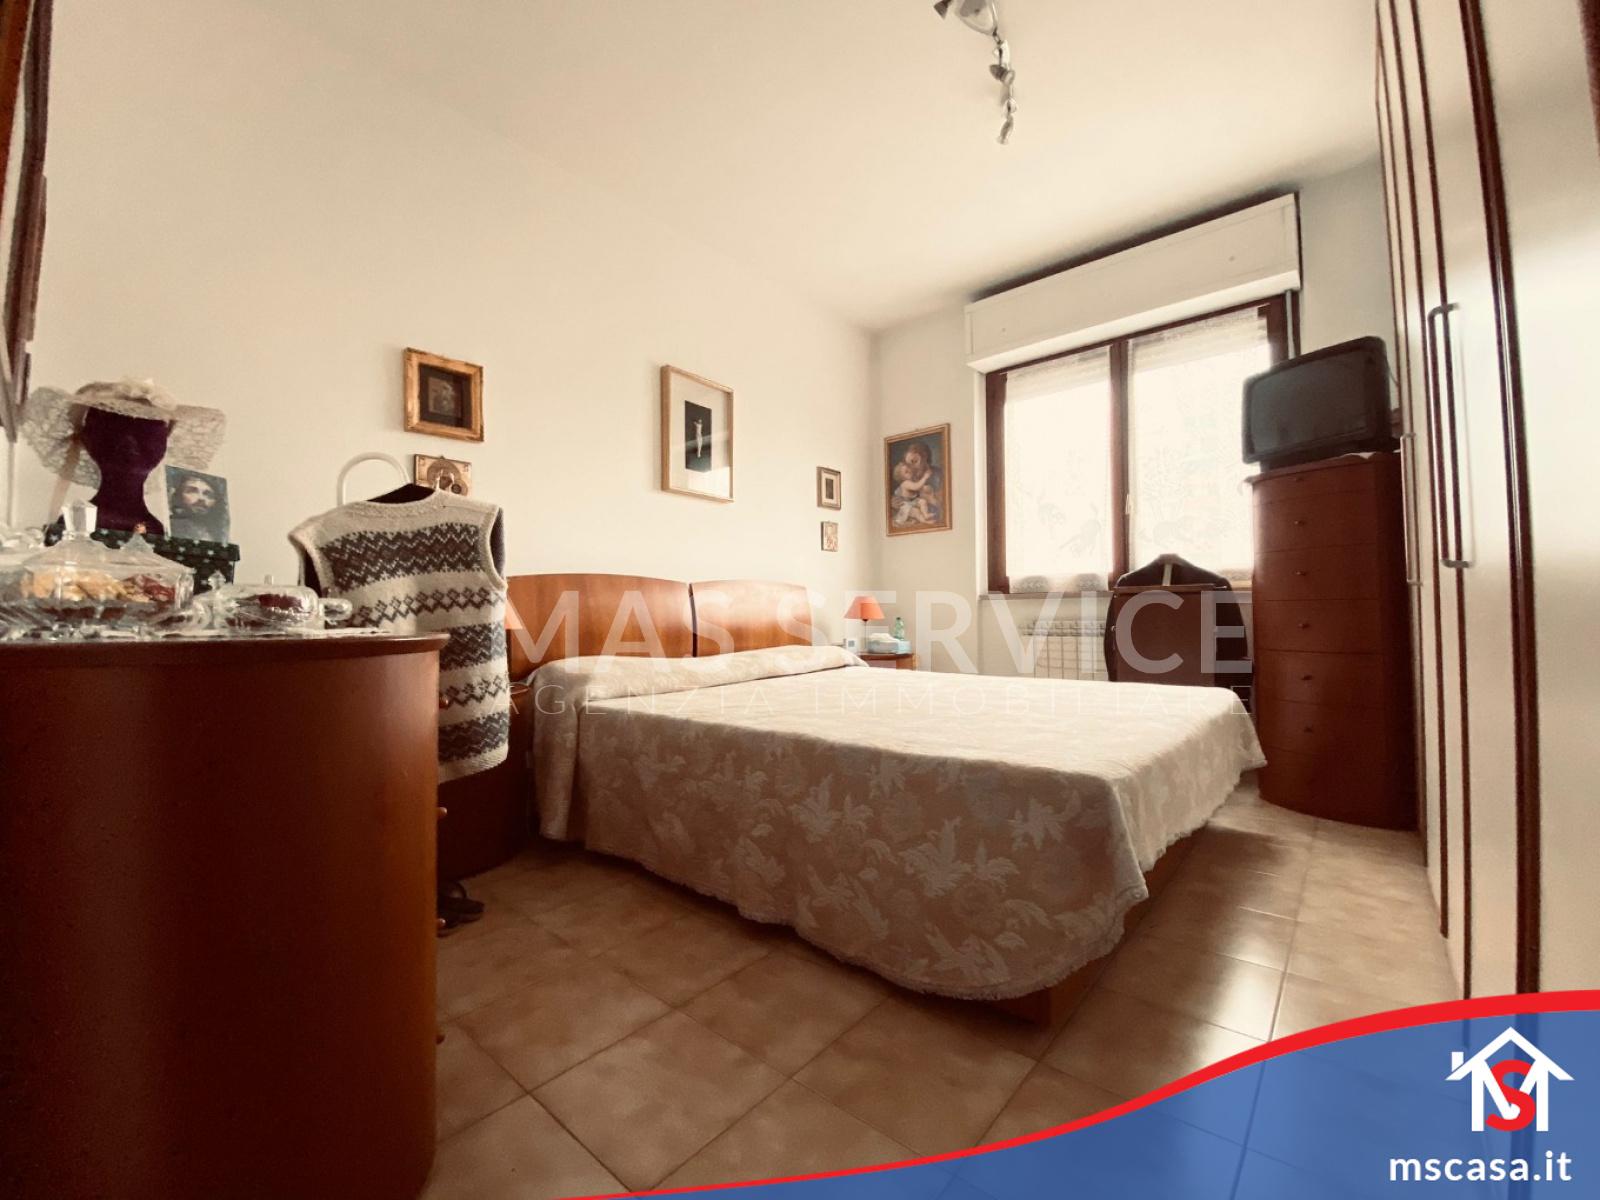 Trilocale in vendita zona Laurentina a Roma Vista Camera Matrimoniale